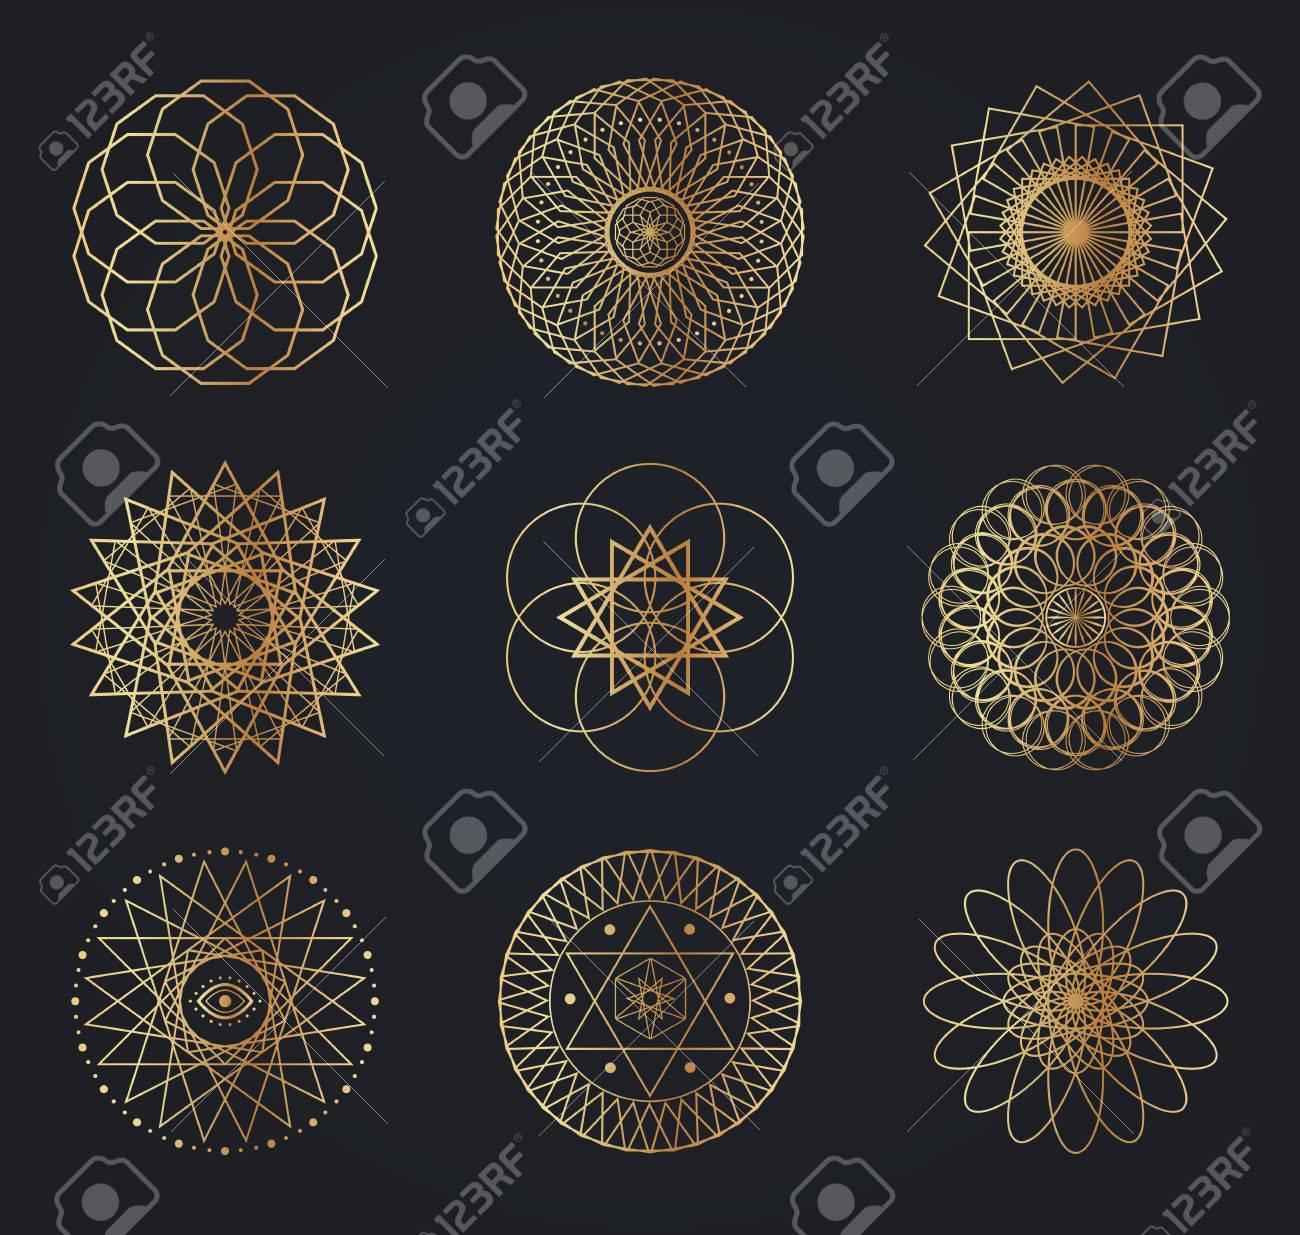 Sacred geometry symbols. Set of vector design elements isolated on black background. - 70082640